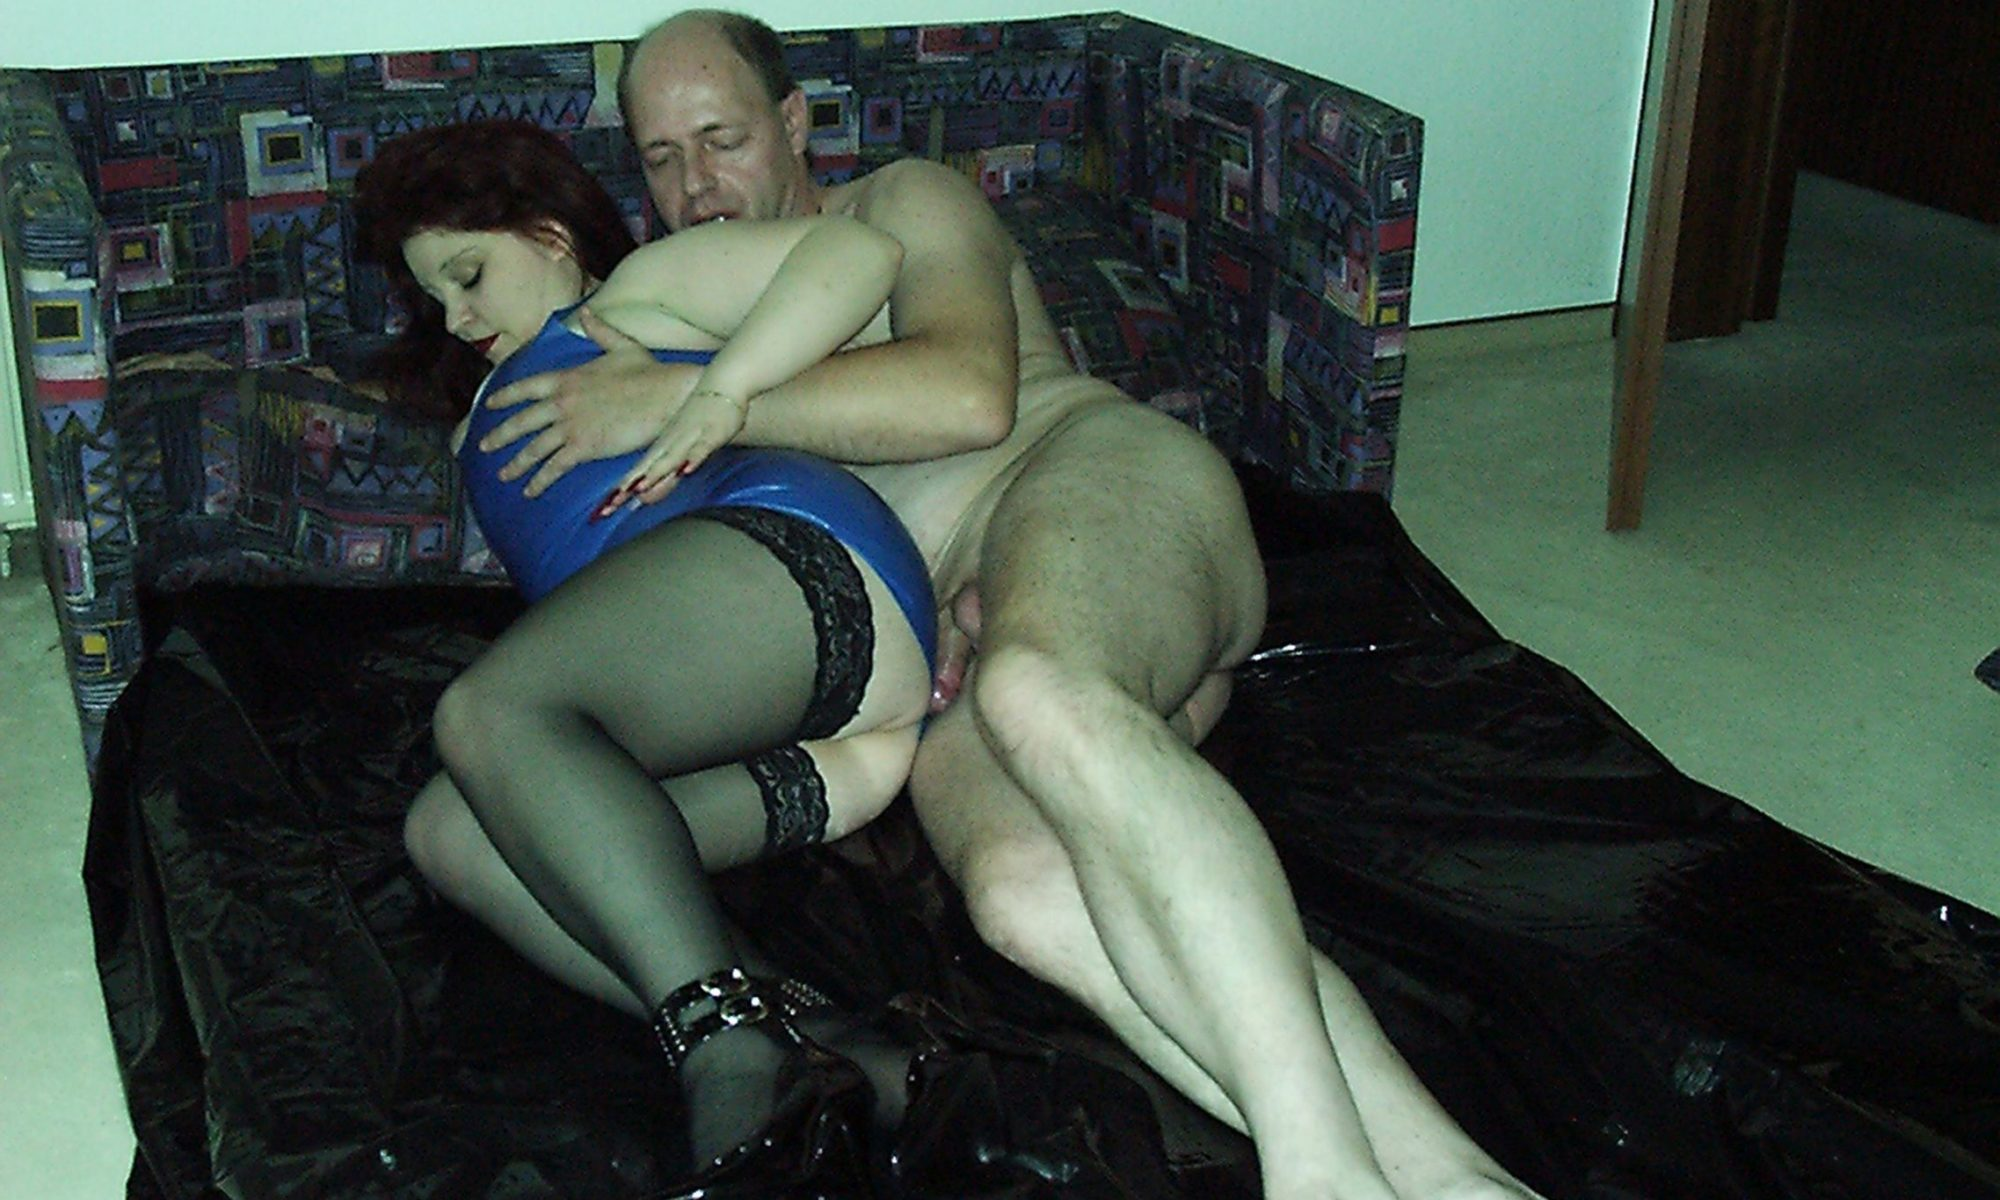 Cuckoldkontakte